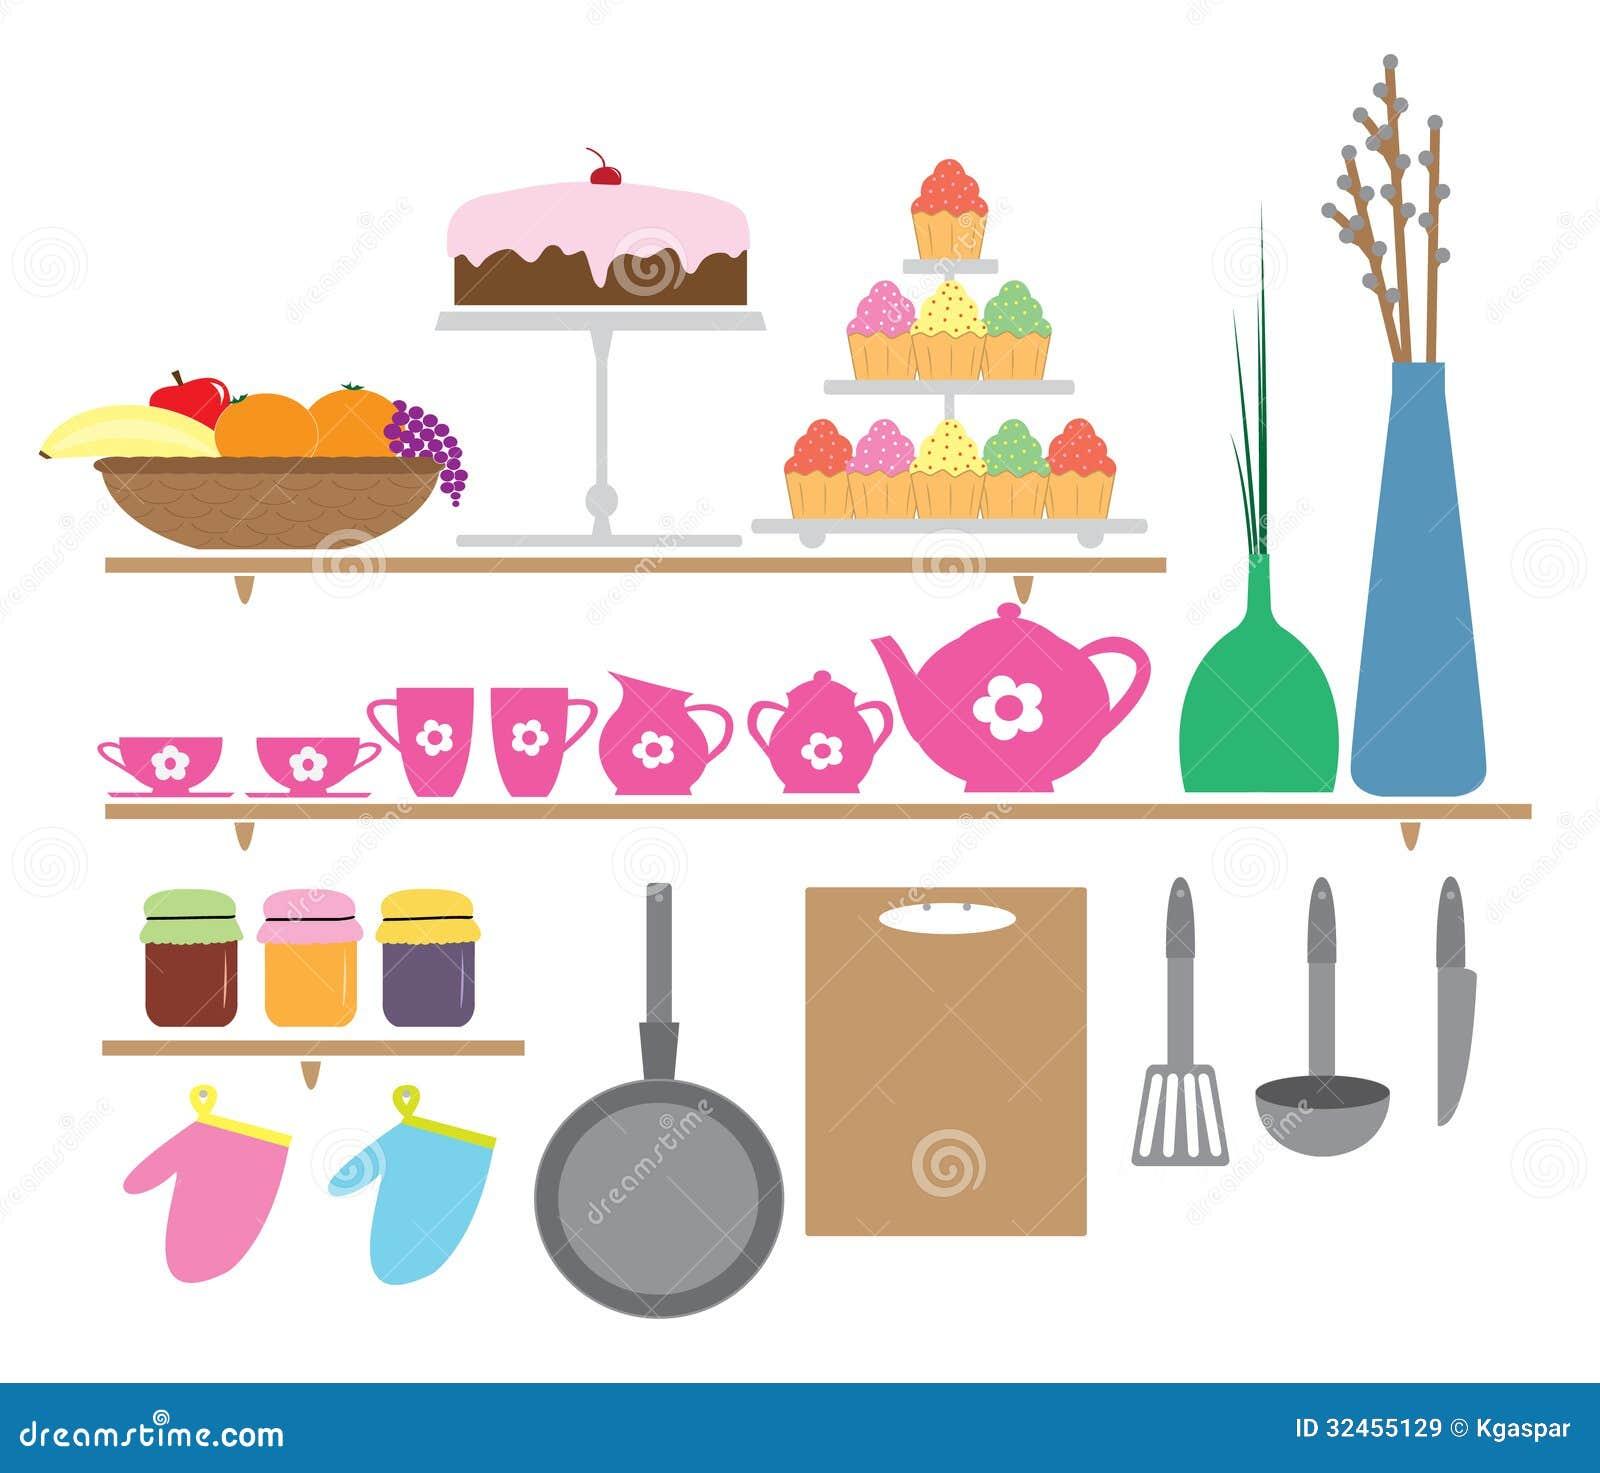 Kitchen roomcartoon 5 for Kitchen room cartoon images